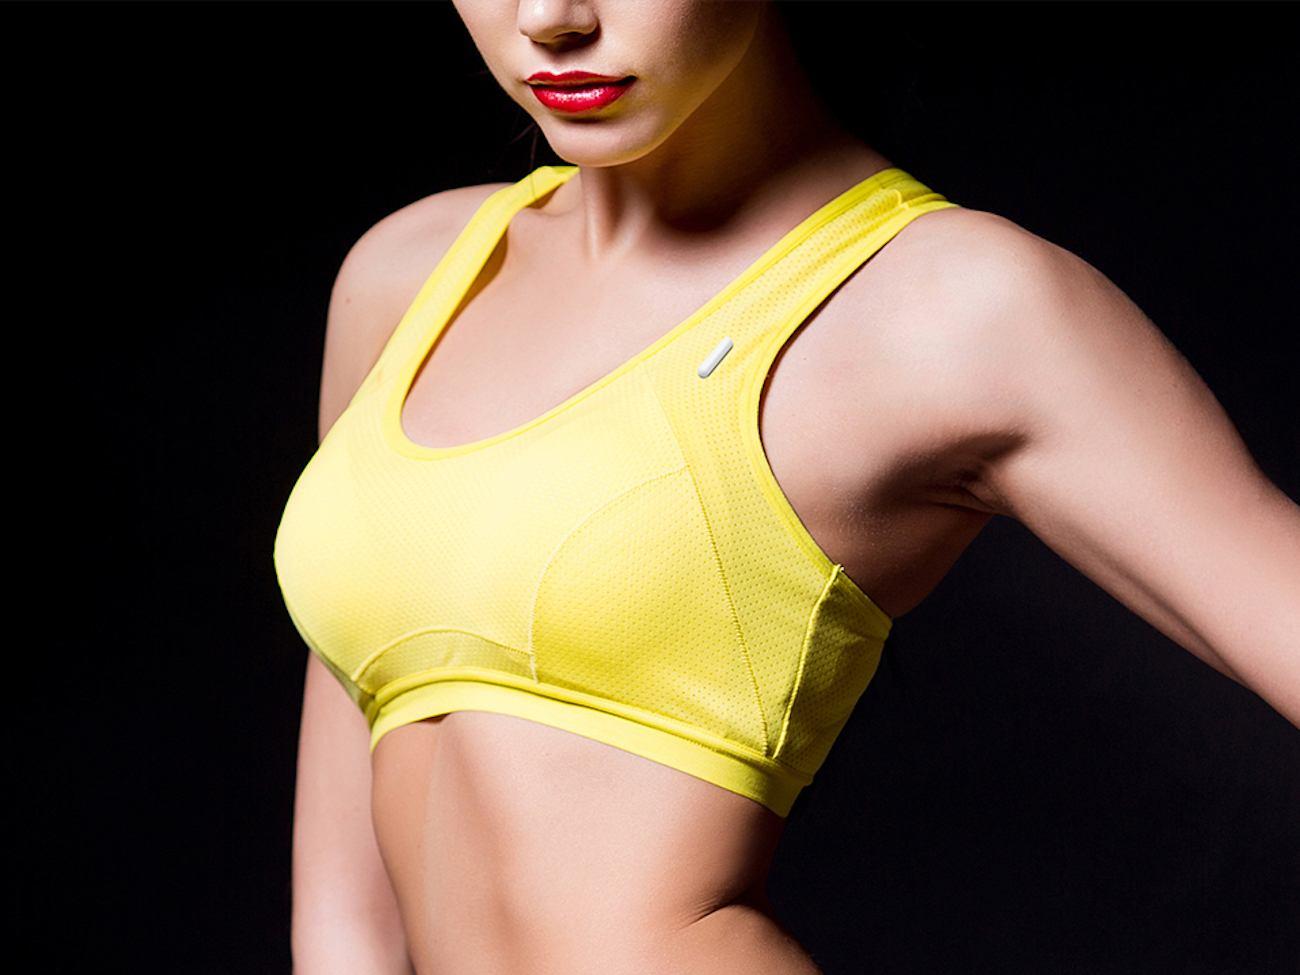 Mevics Wearable Posture Tracker